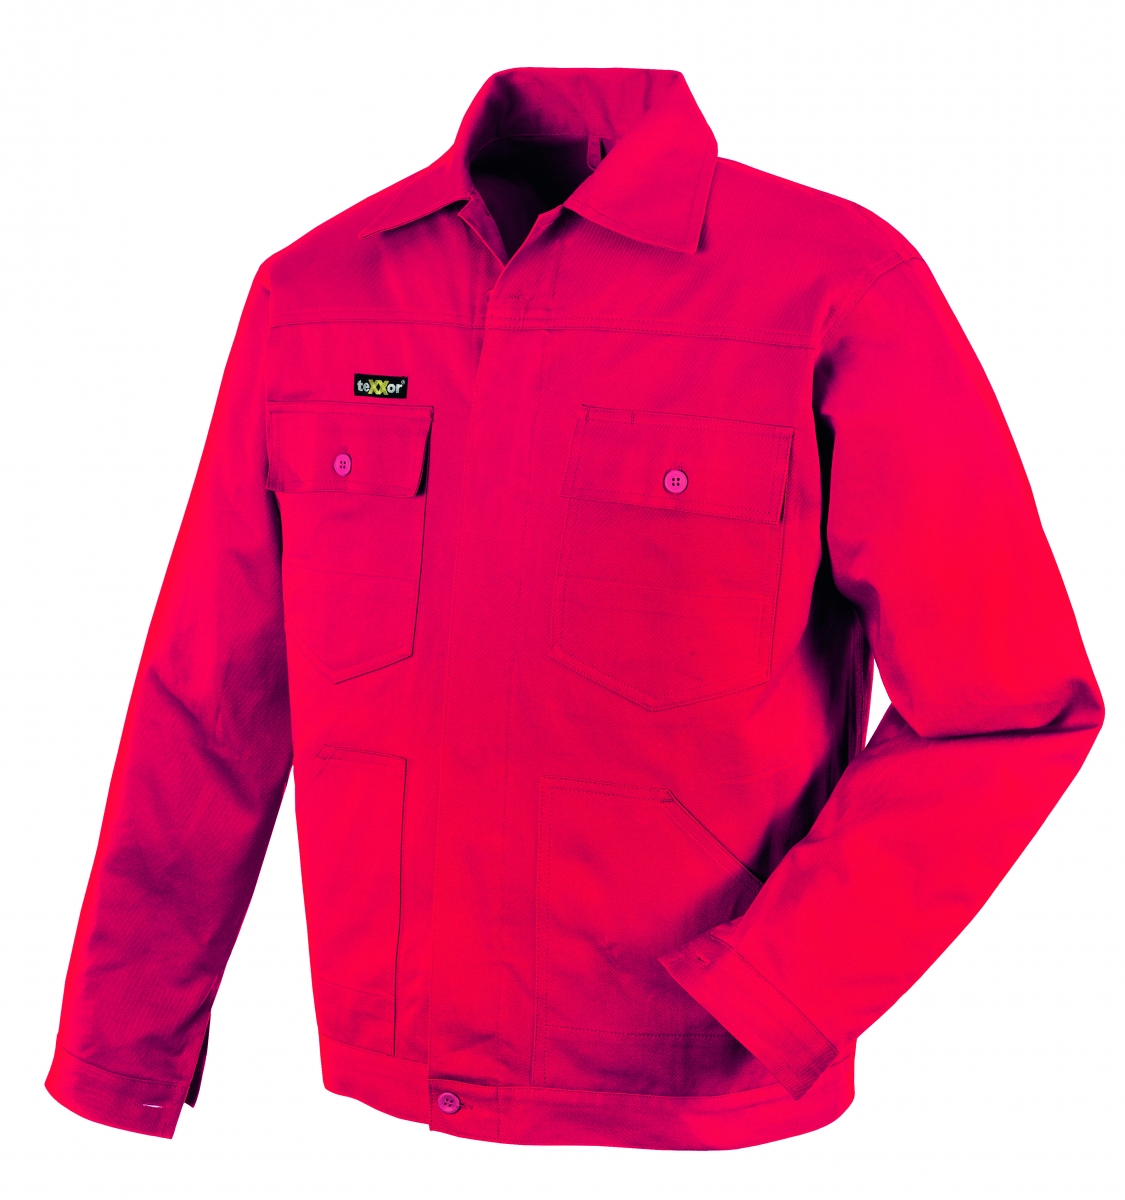 BIG-TEXXOR-Arbeits-Berufs-Bund-Jacke, 290g/m², rot